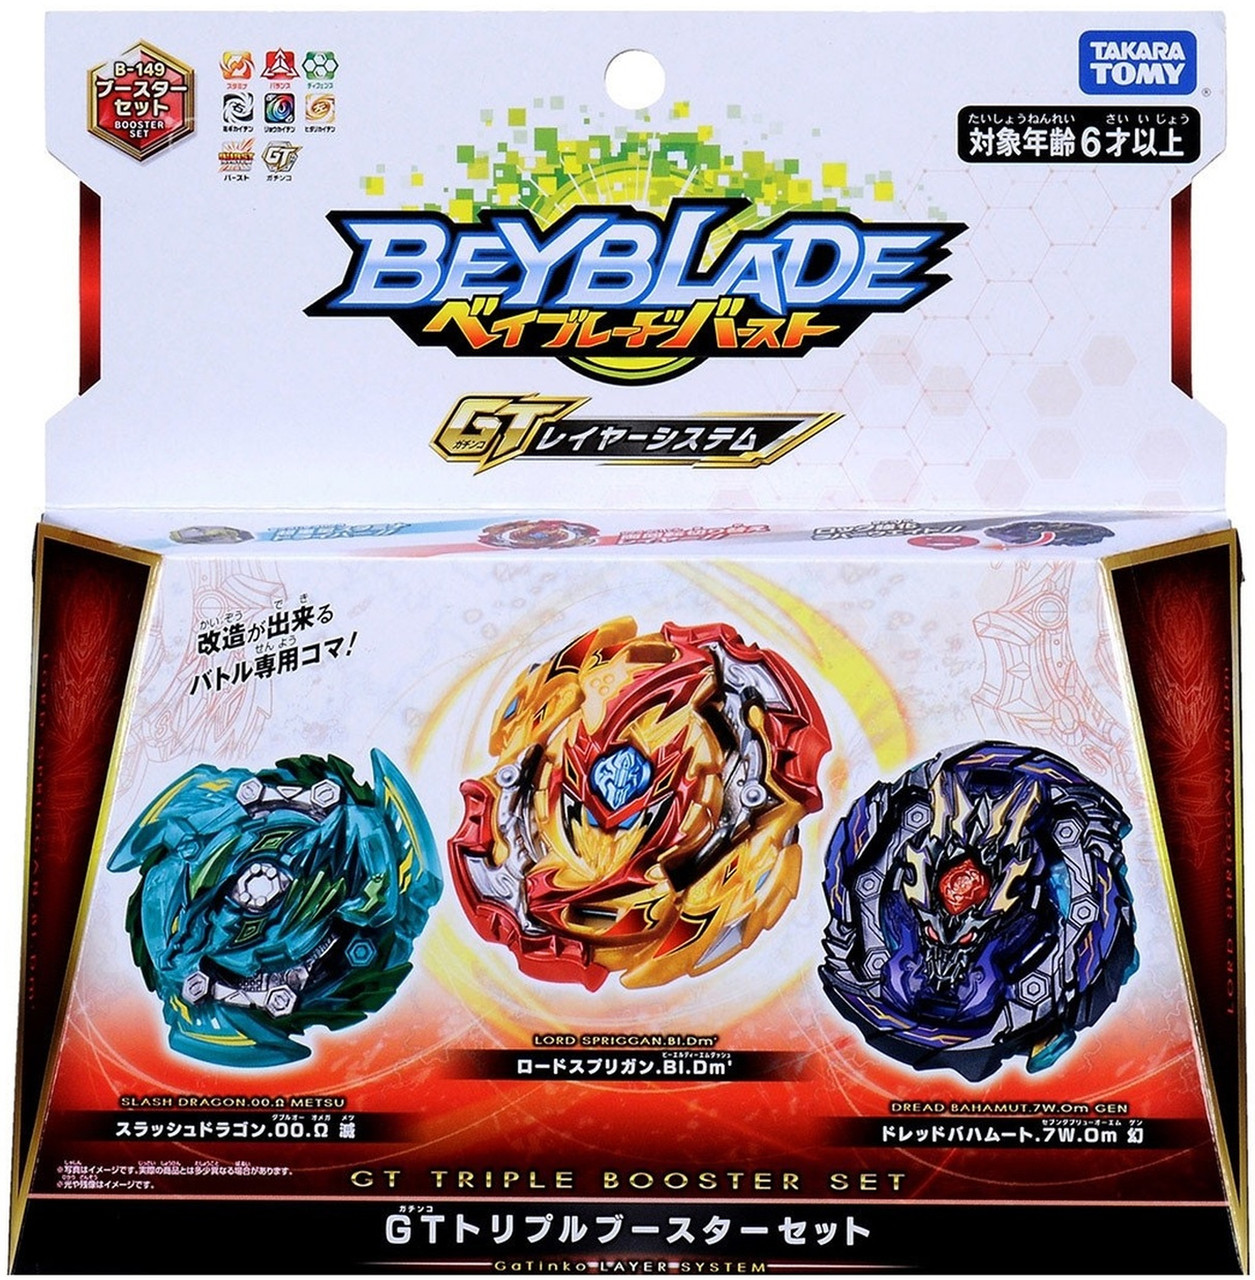 NEW Takara Tomy Beyblade GT Triple Booster Set GaTinko Layer System B-149